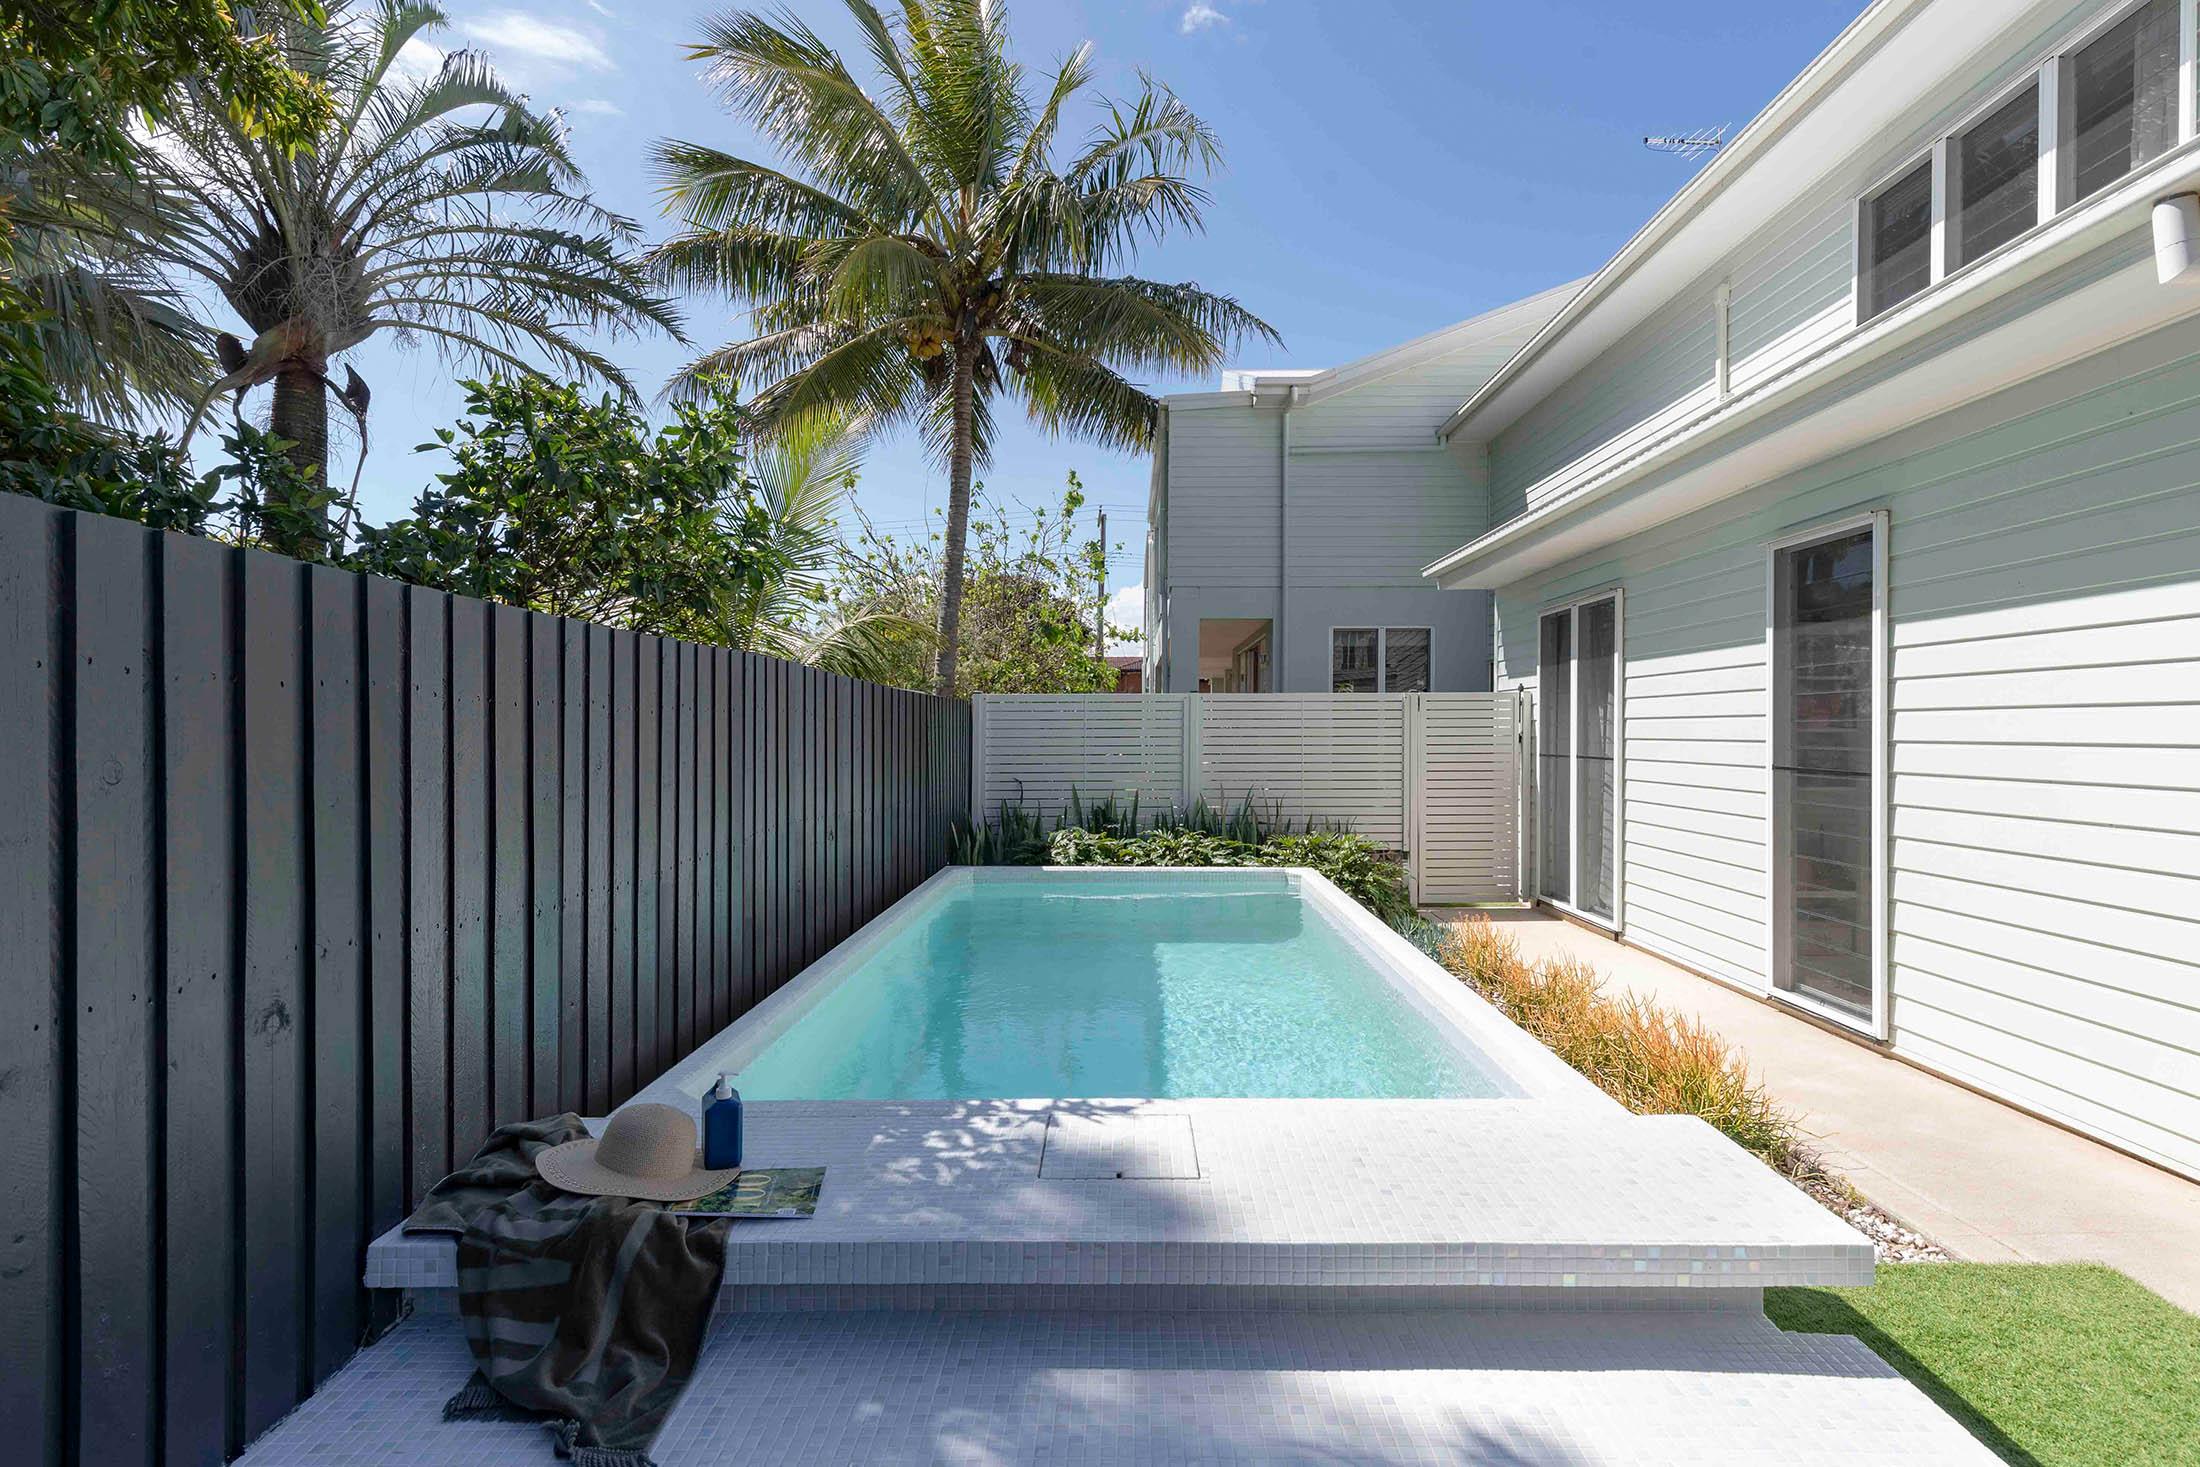 Semi above-ground Plungie Original 4.6m x 2.5m plunge pool in Kona Coast